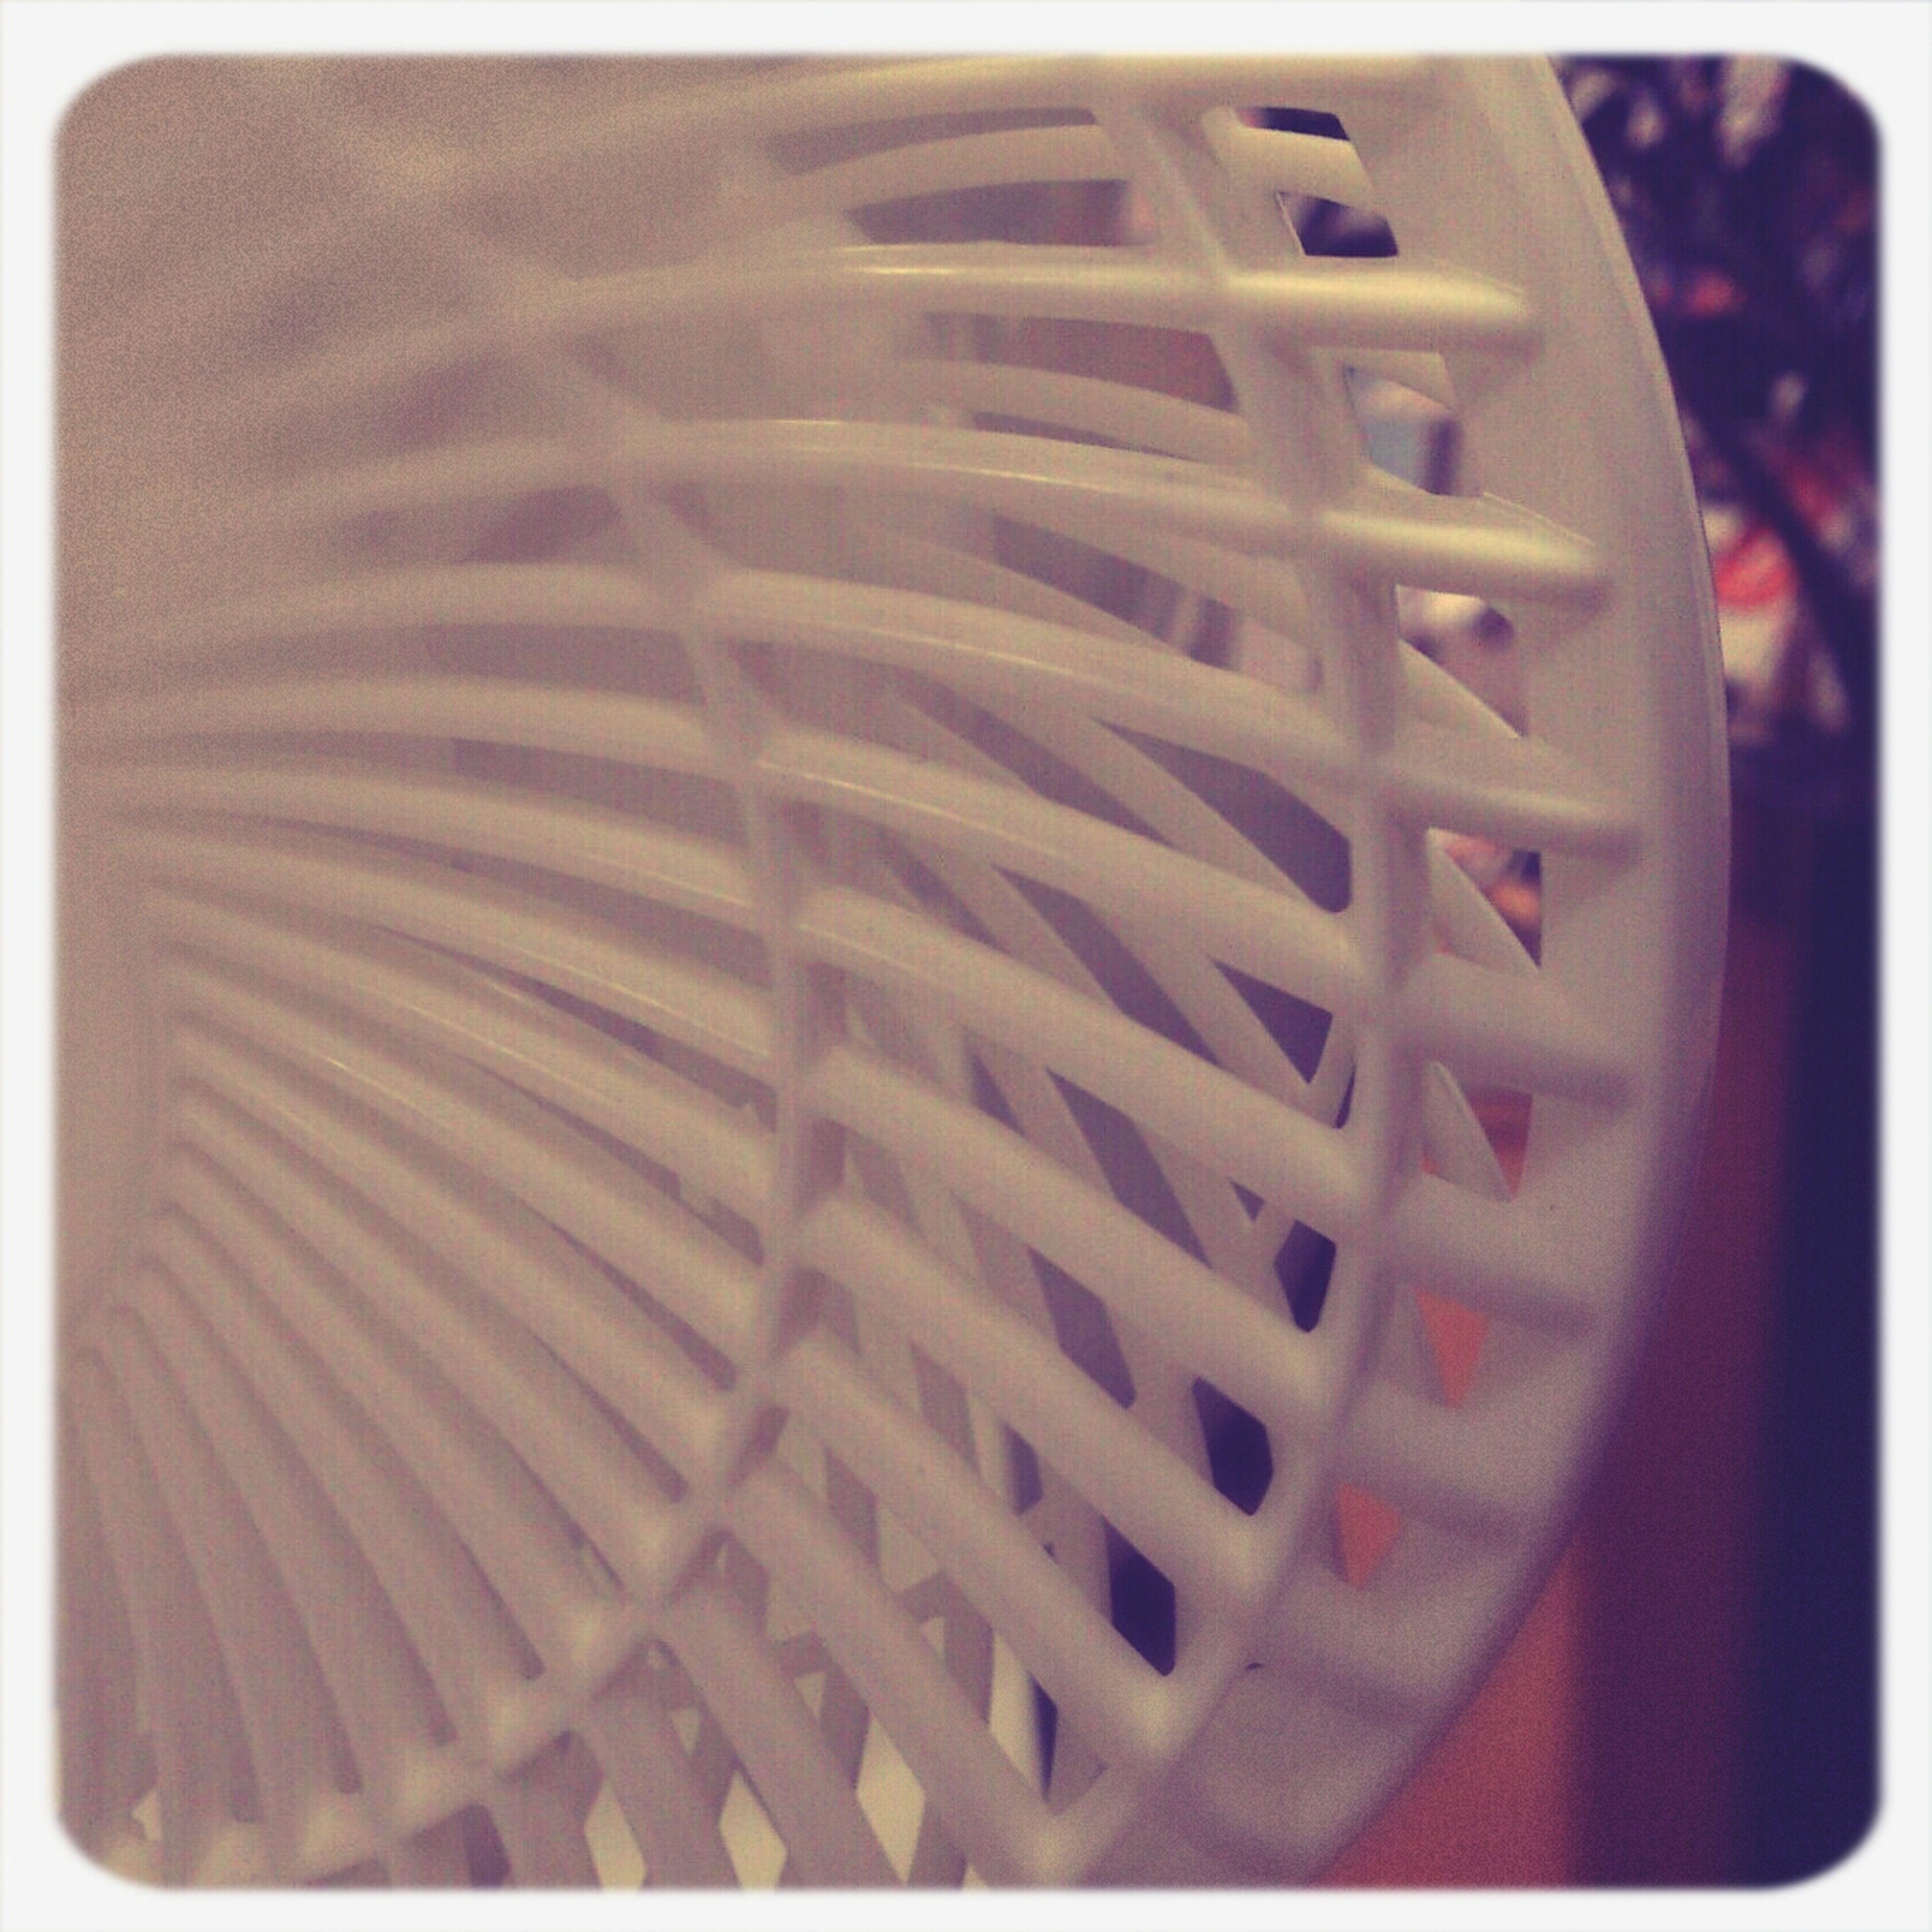 Ventilator am Arbeitsplatz: check!